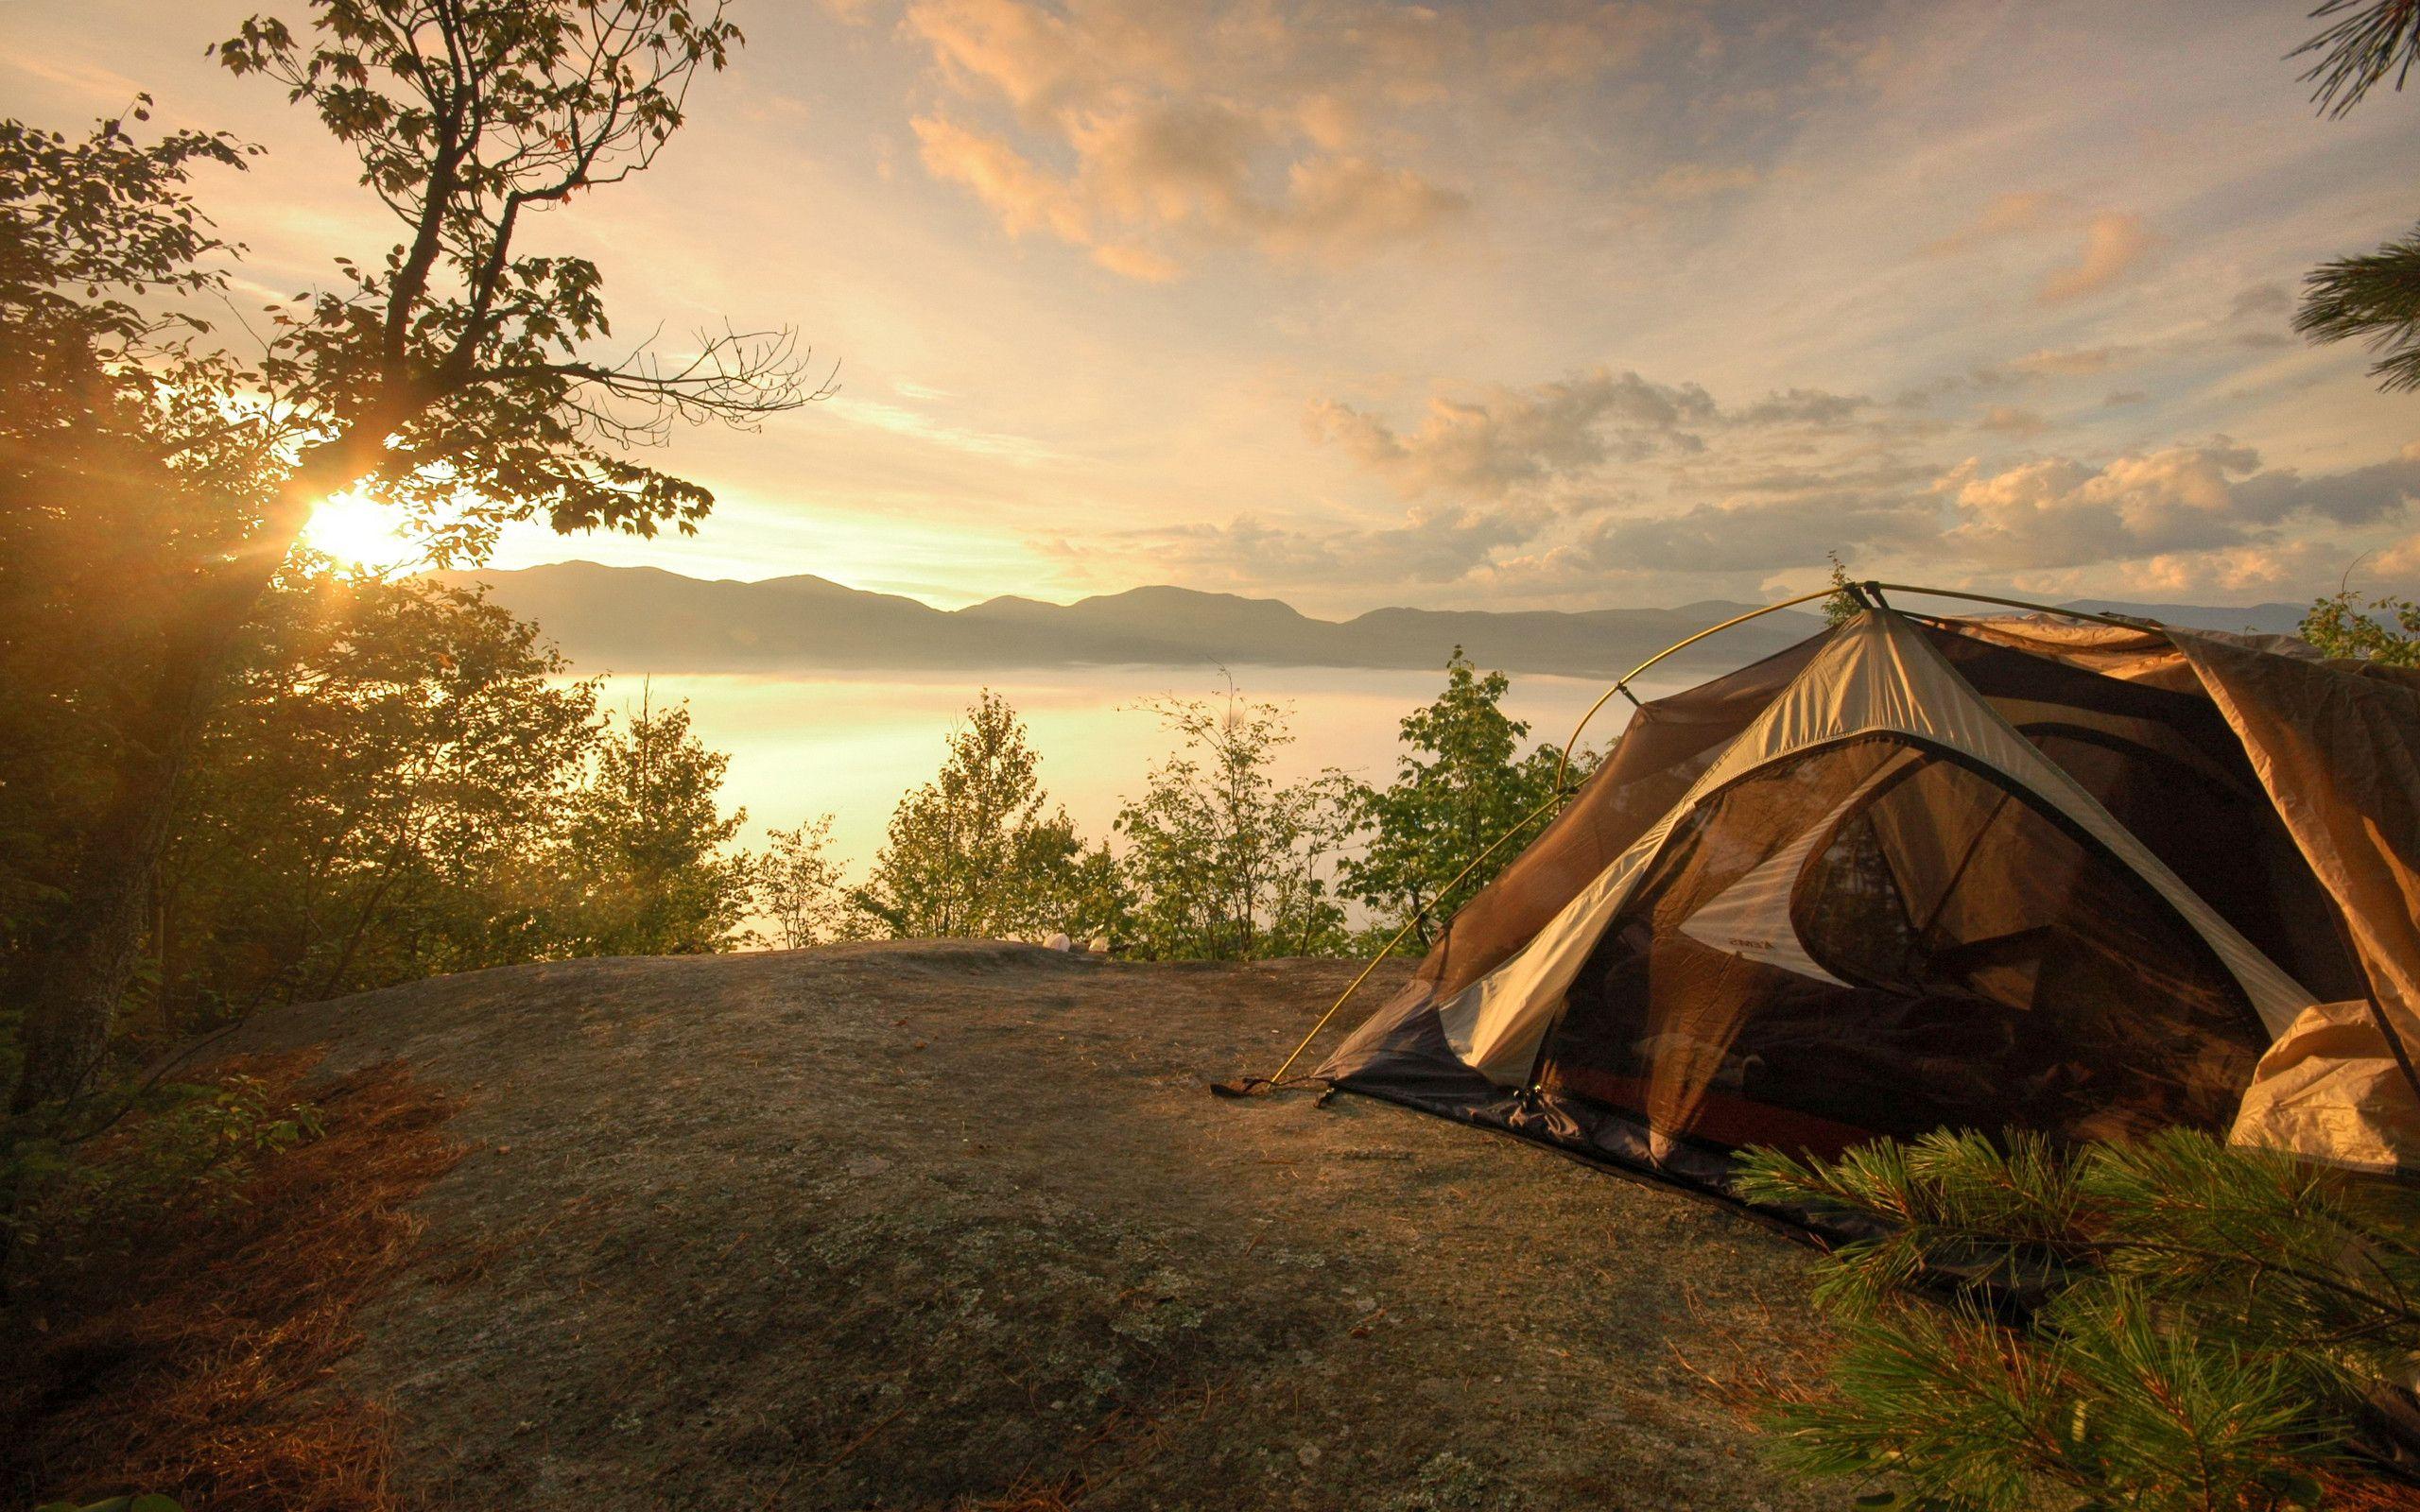 Camping Desktop Wallpapers   Top Camping Desktop Backgrounds 2560x1600